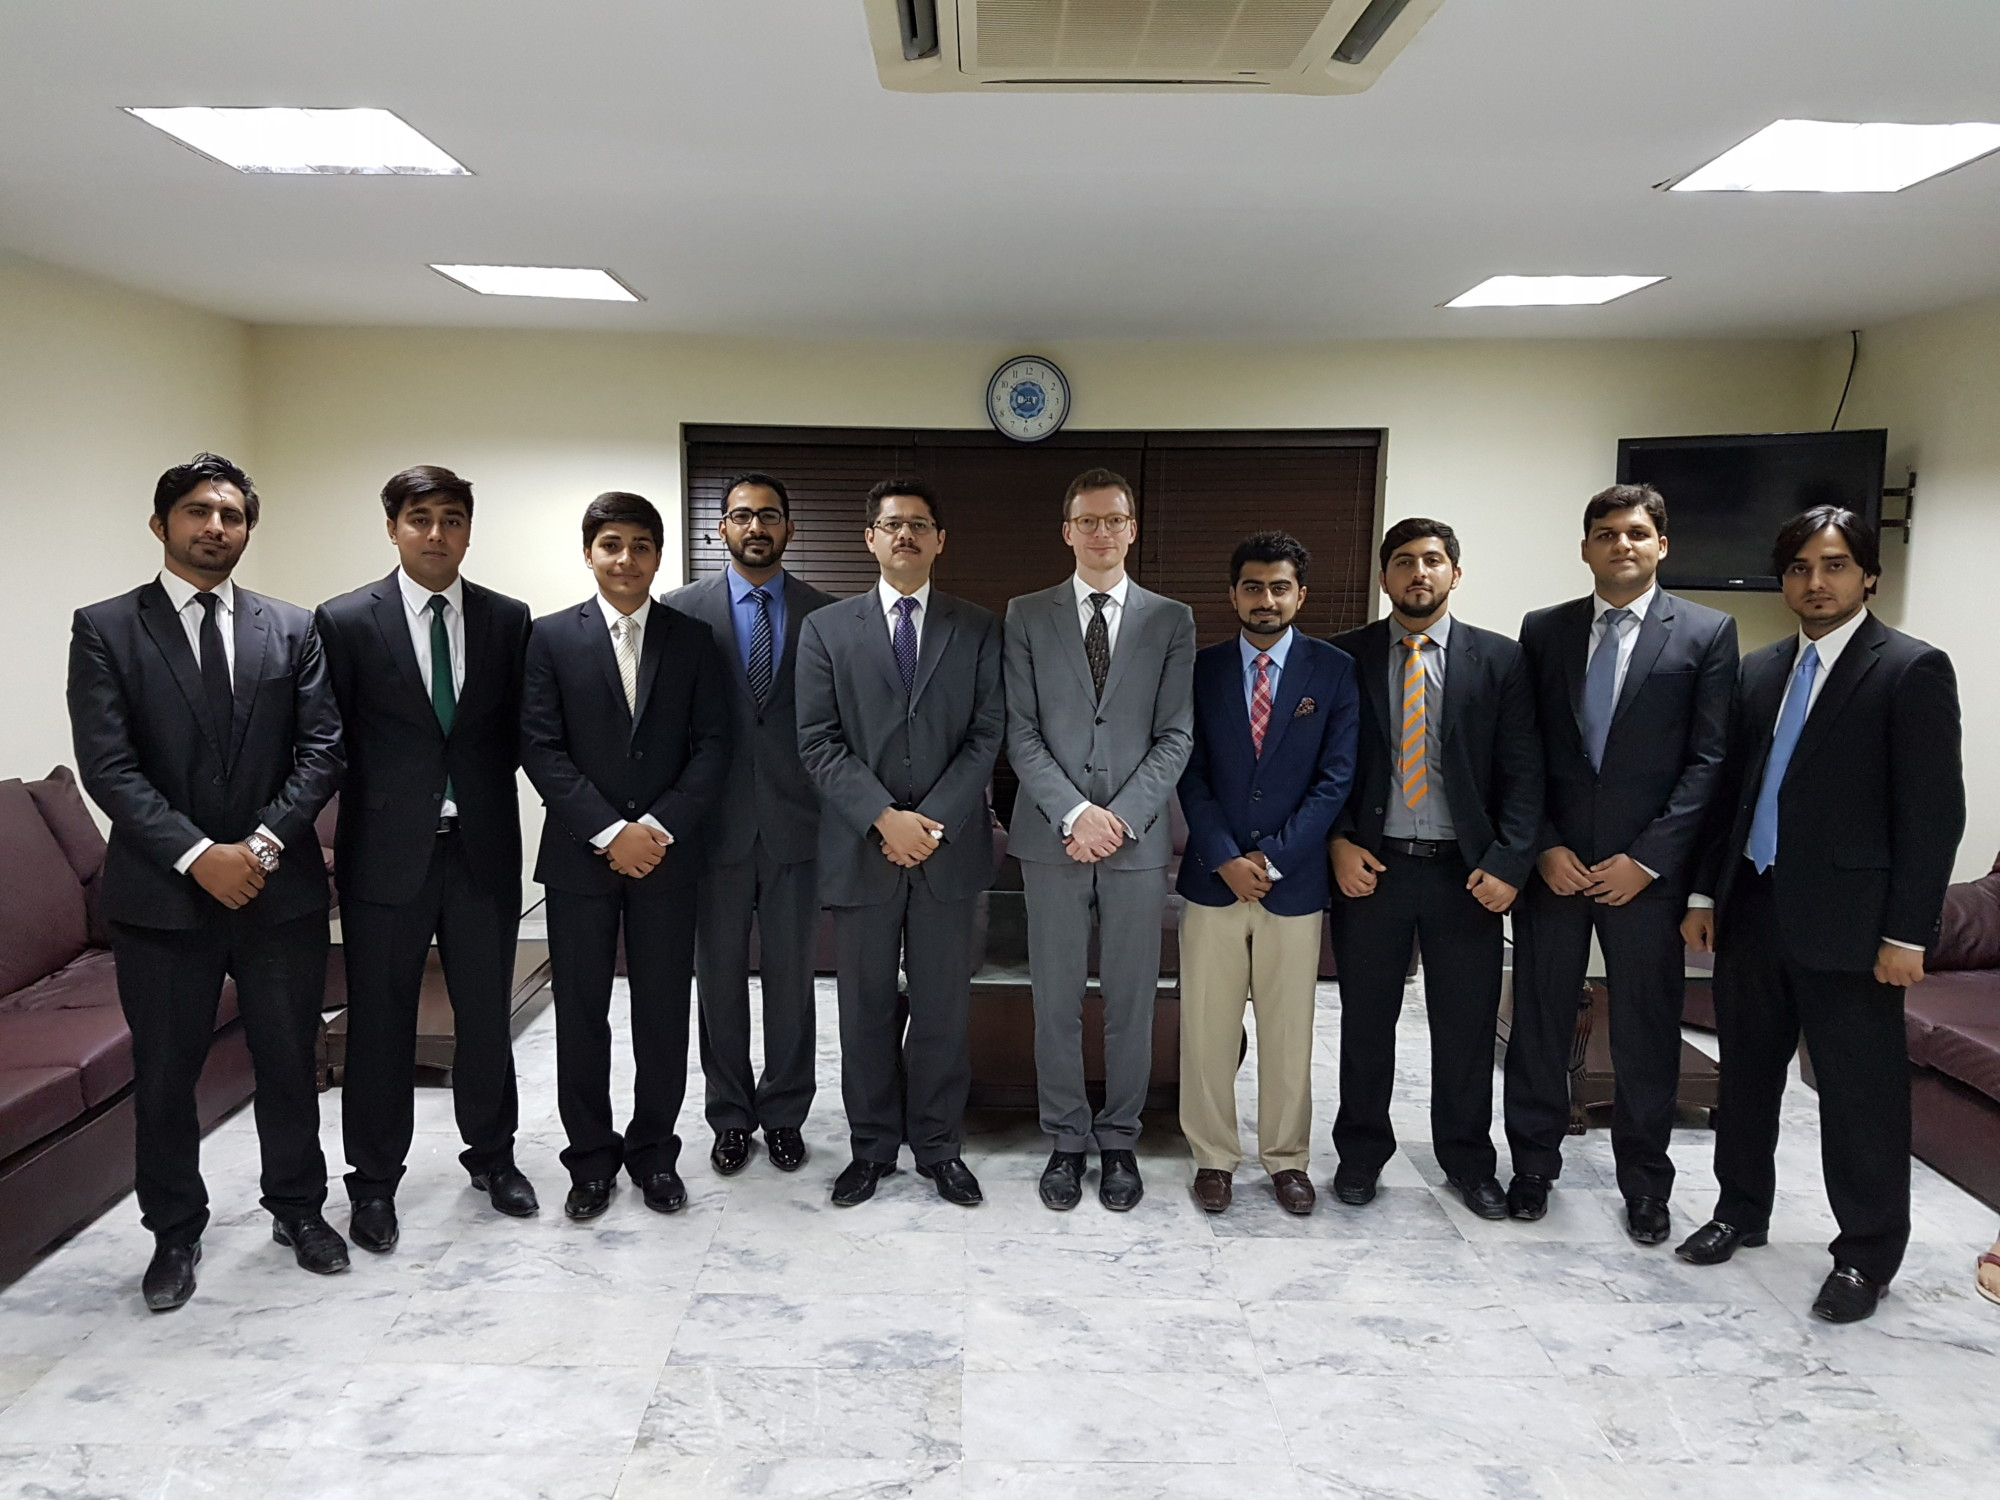 Law dissertation topics in india